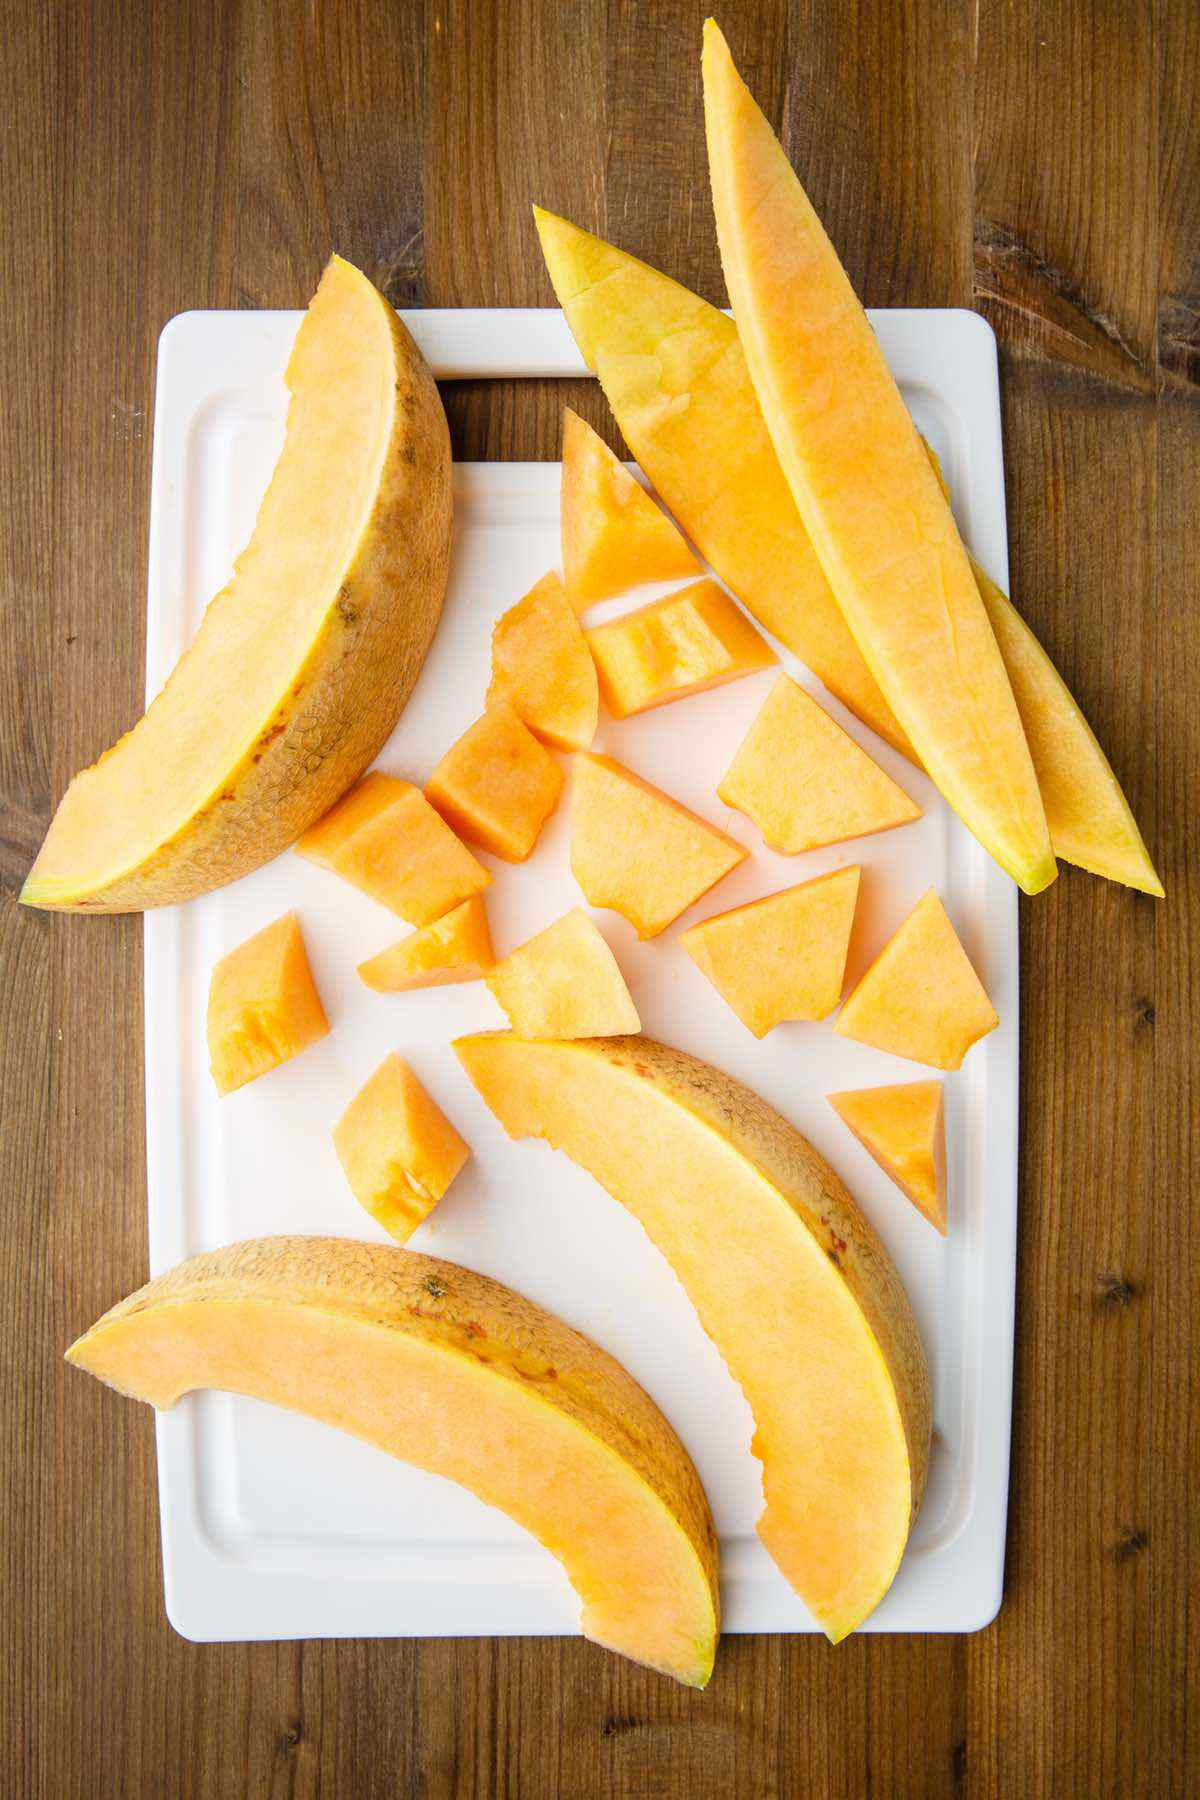 cutting up melon